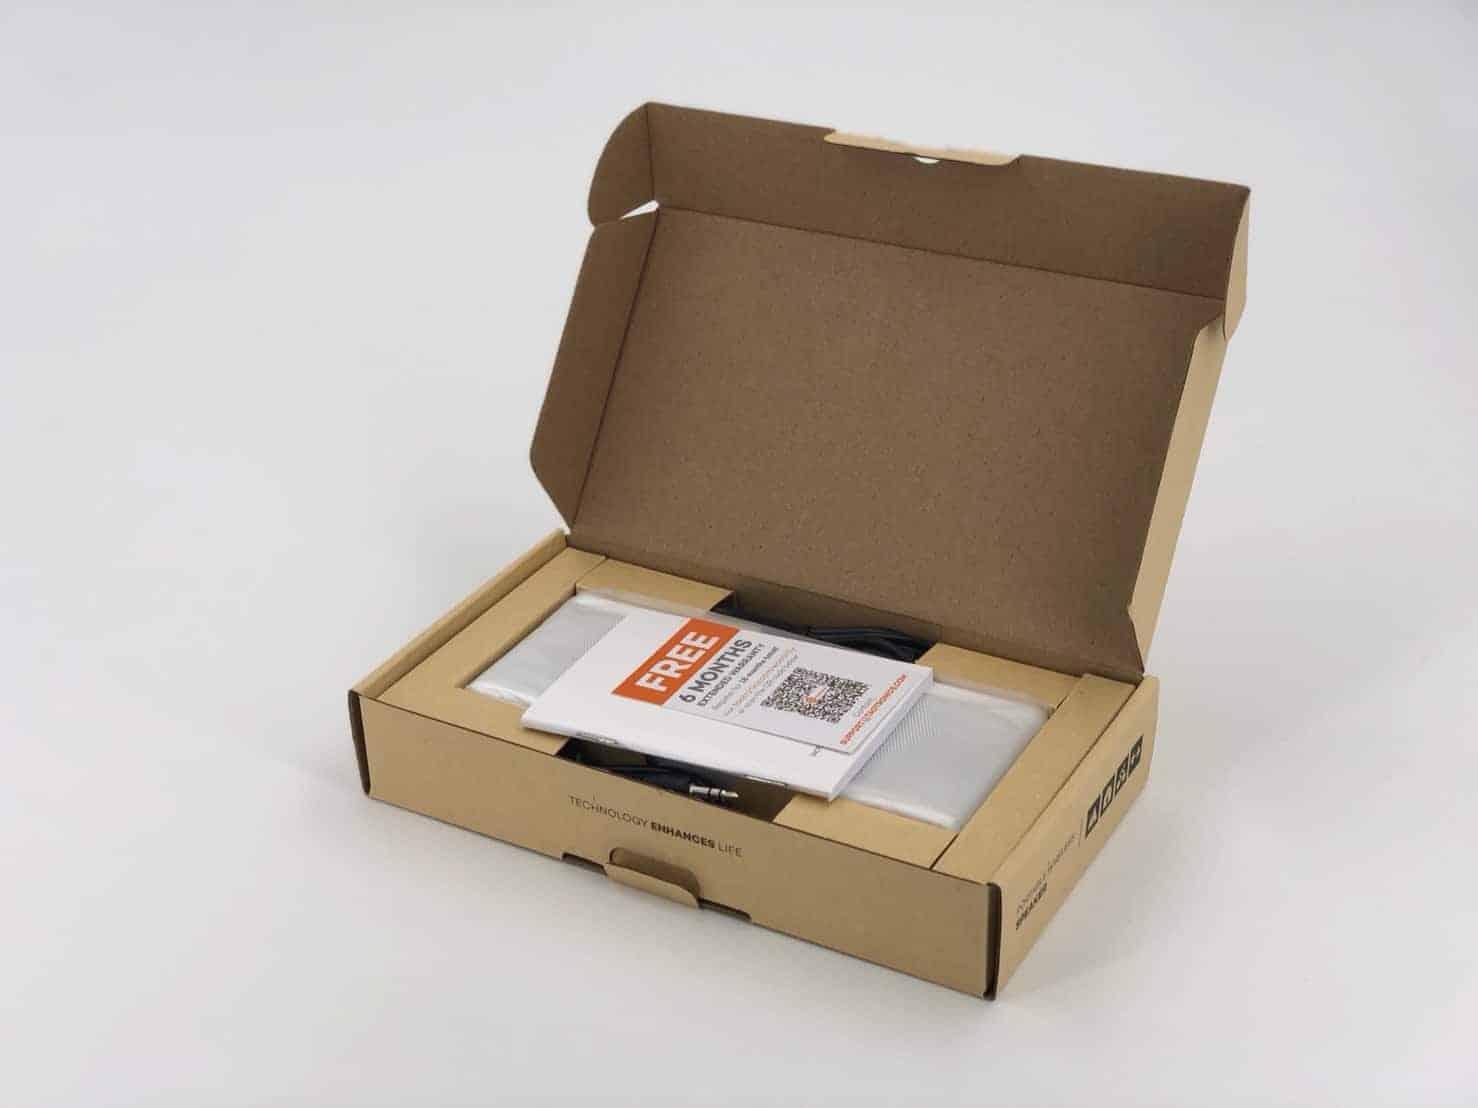 Sony XB01及JBL GO都望塵莫及的好聲音 - TaoTronics TT-SK09防水藍芽喇叭推薦-TechTeller (科技說)